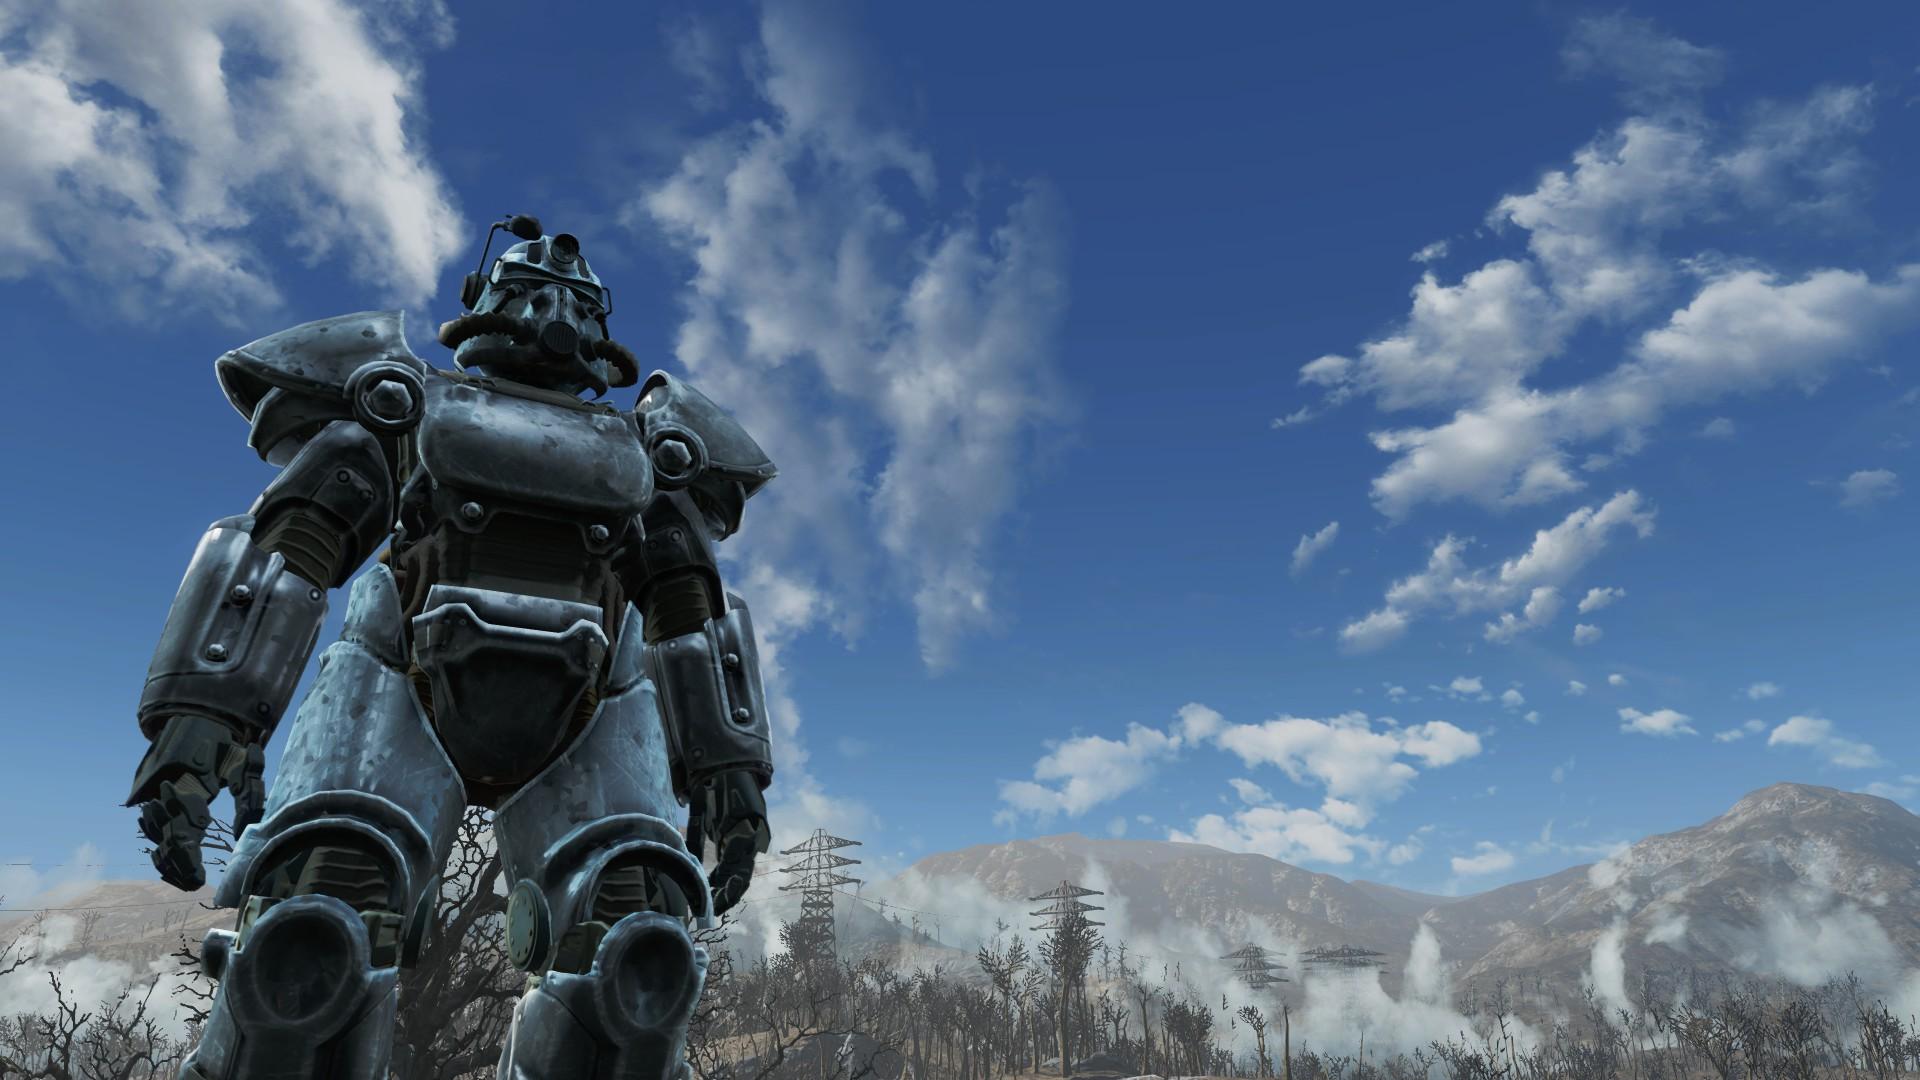 20190407205211_1.jpg - Fallout 4